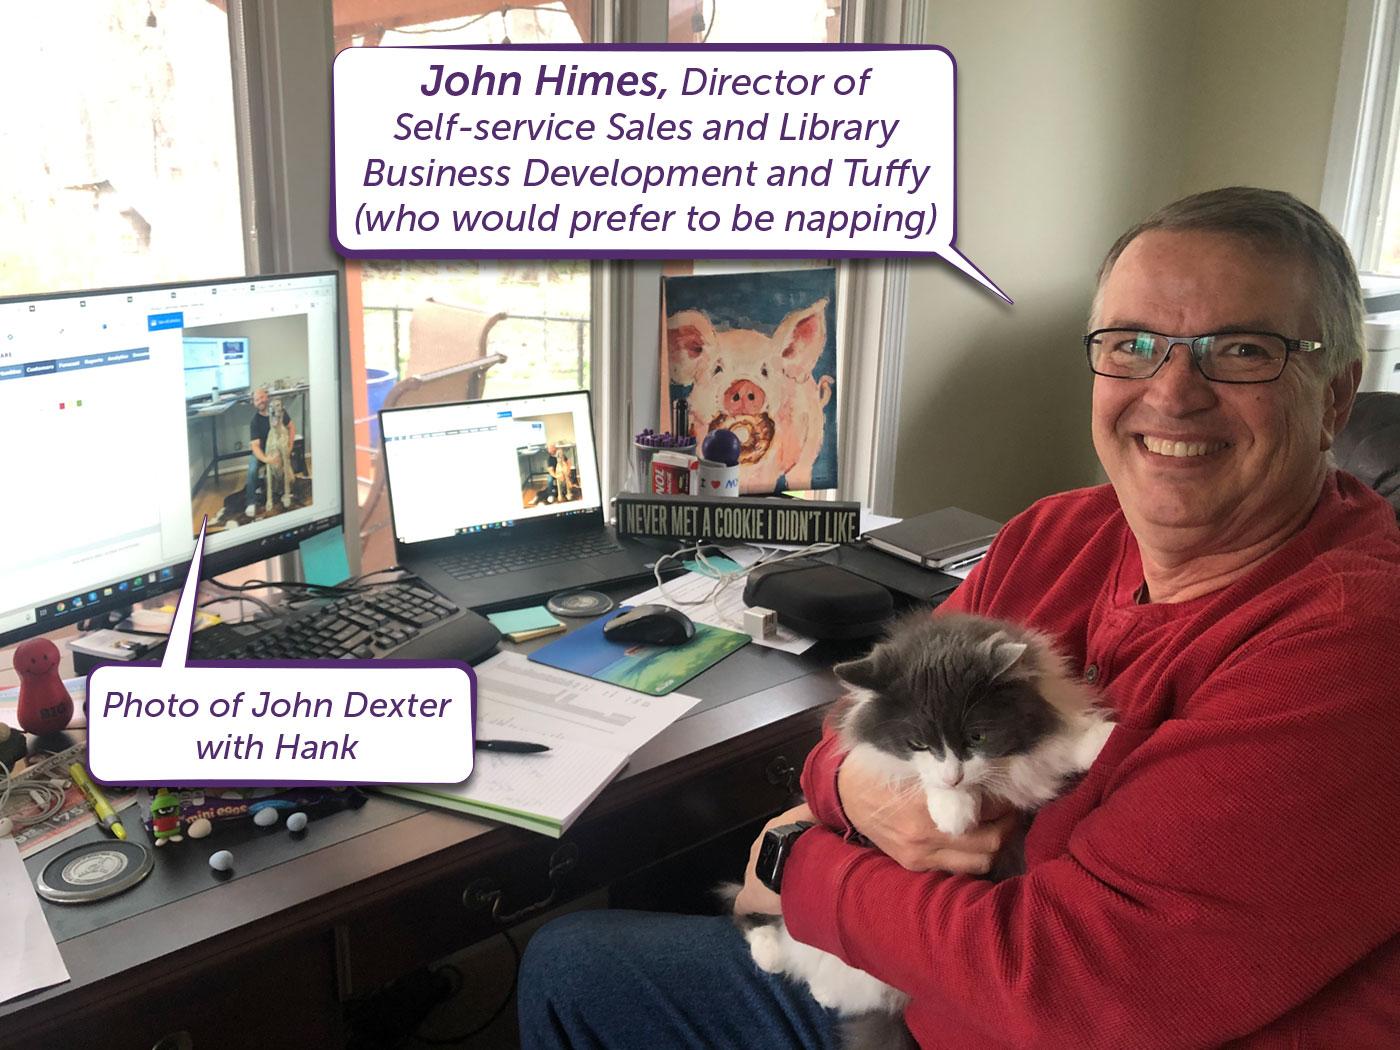 John Himes @Home